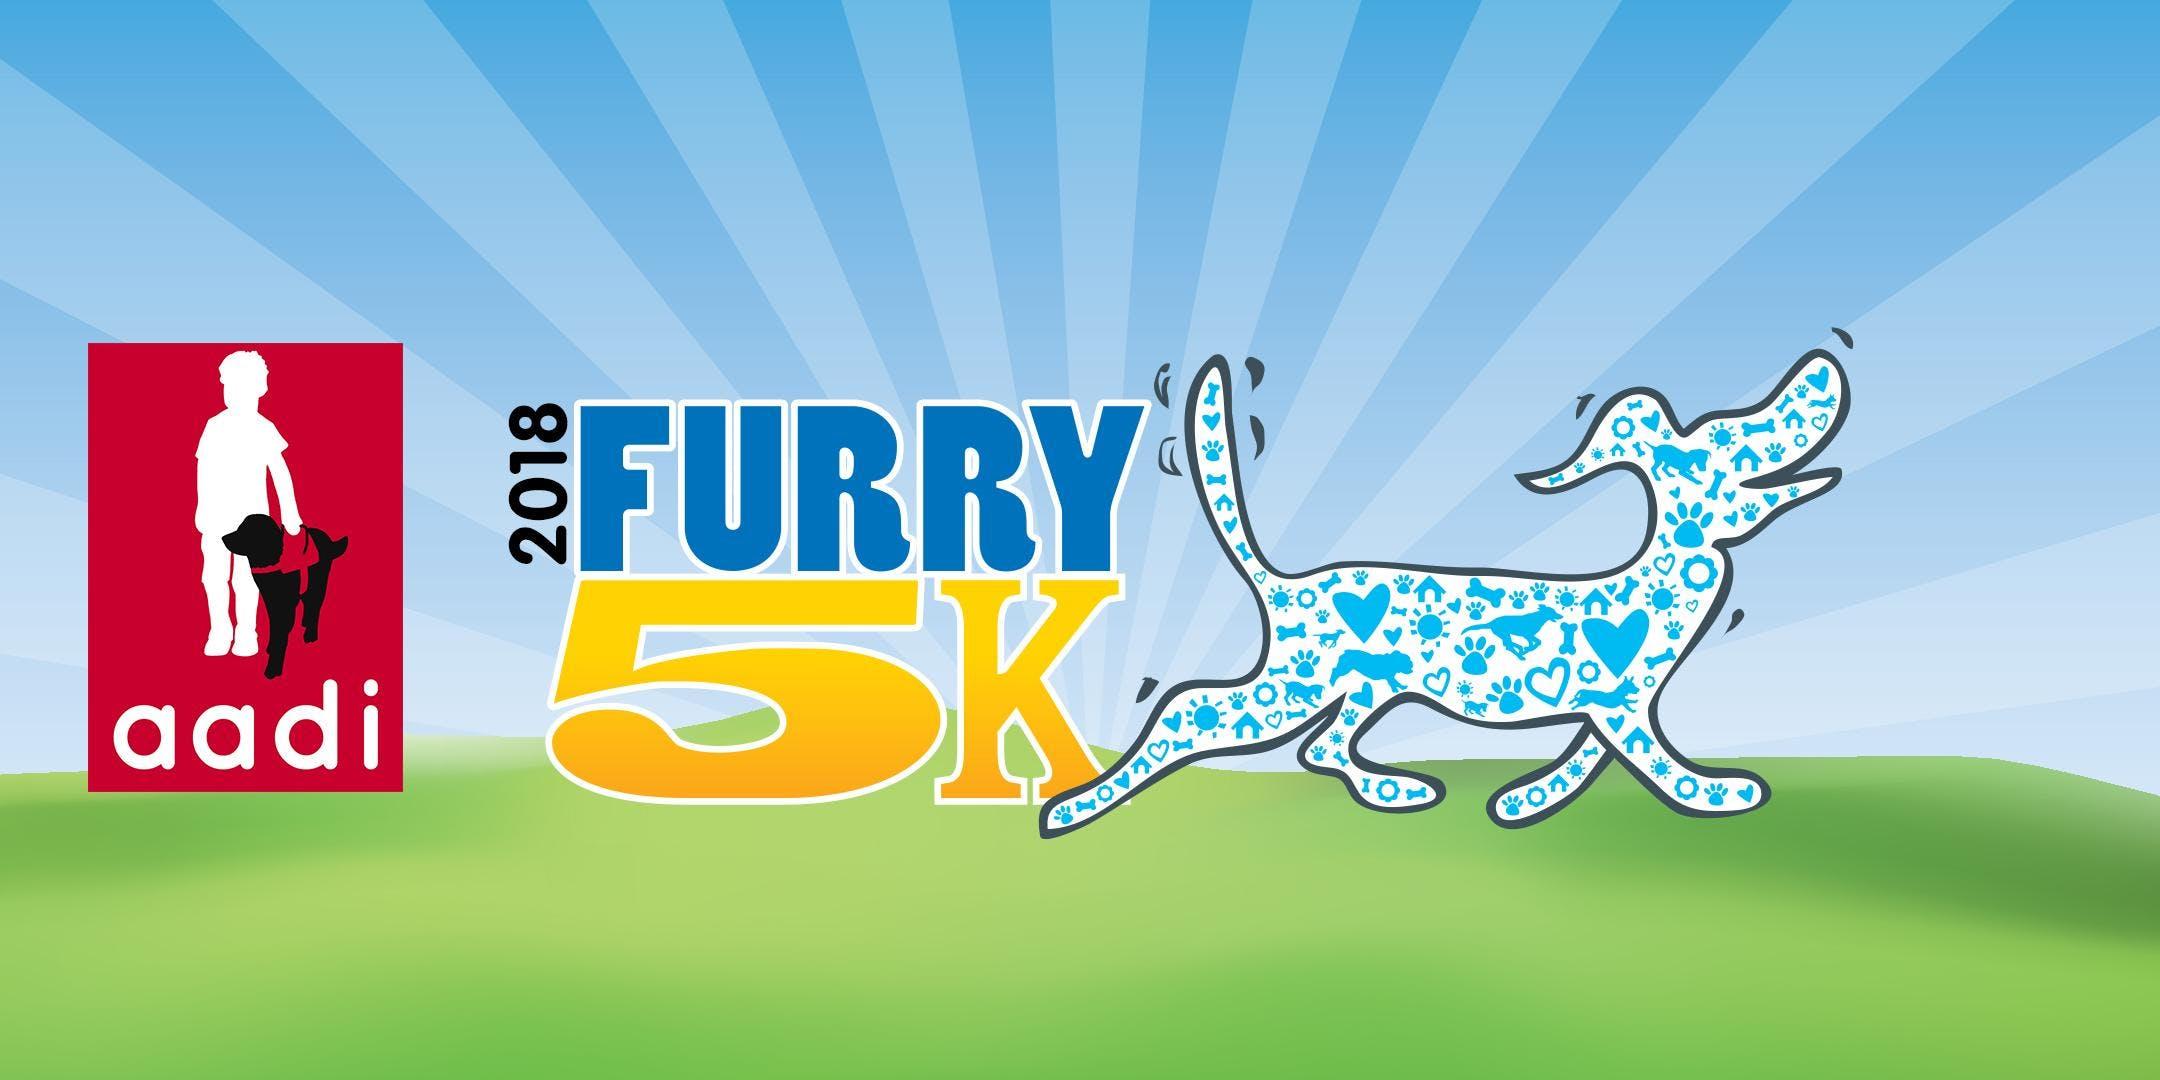 Petworld Athlone Furry 5k Annual Sponsored Dog Walk 2018